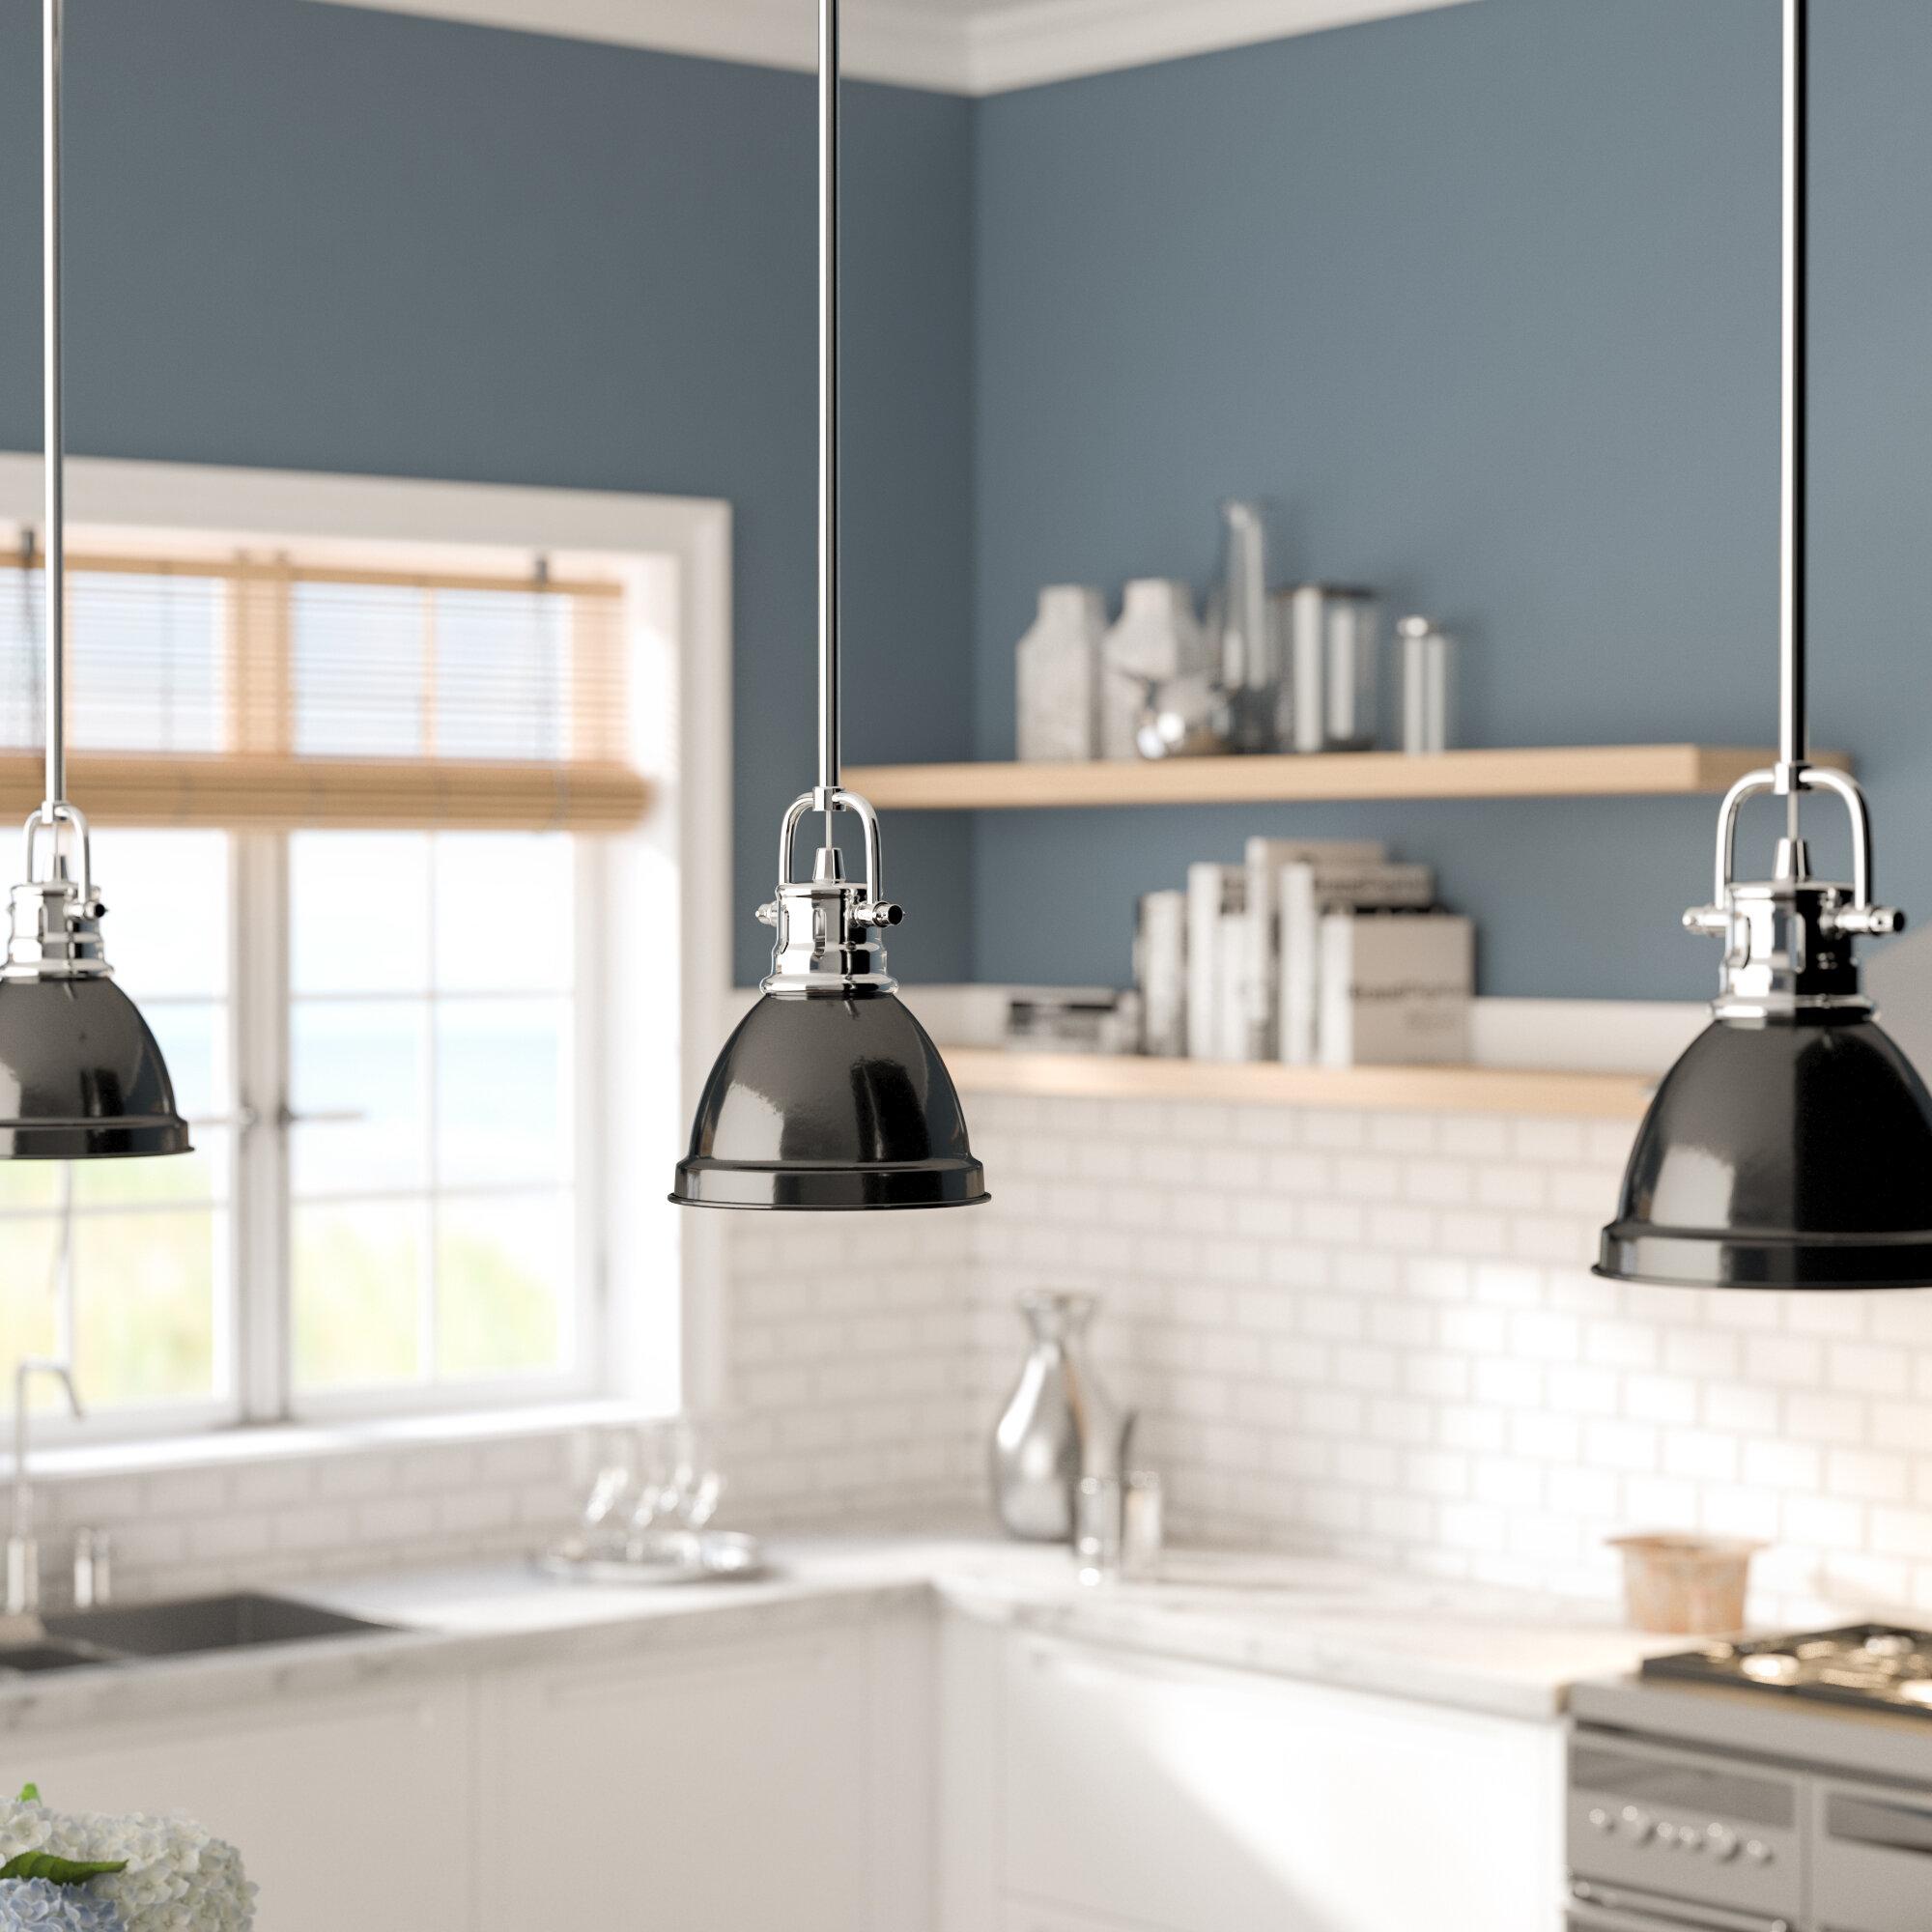 Beachcrest Home Bodalla 1 Light Single Dome Pendant Reviews Wayfair